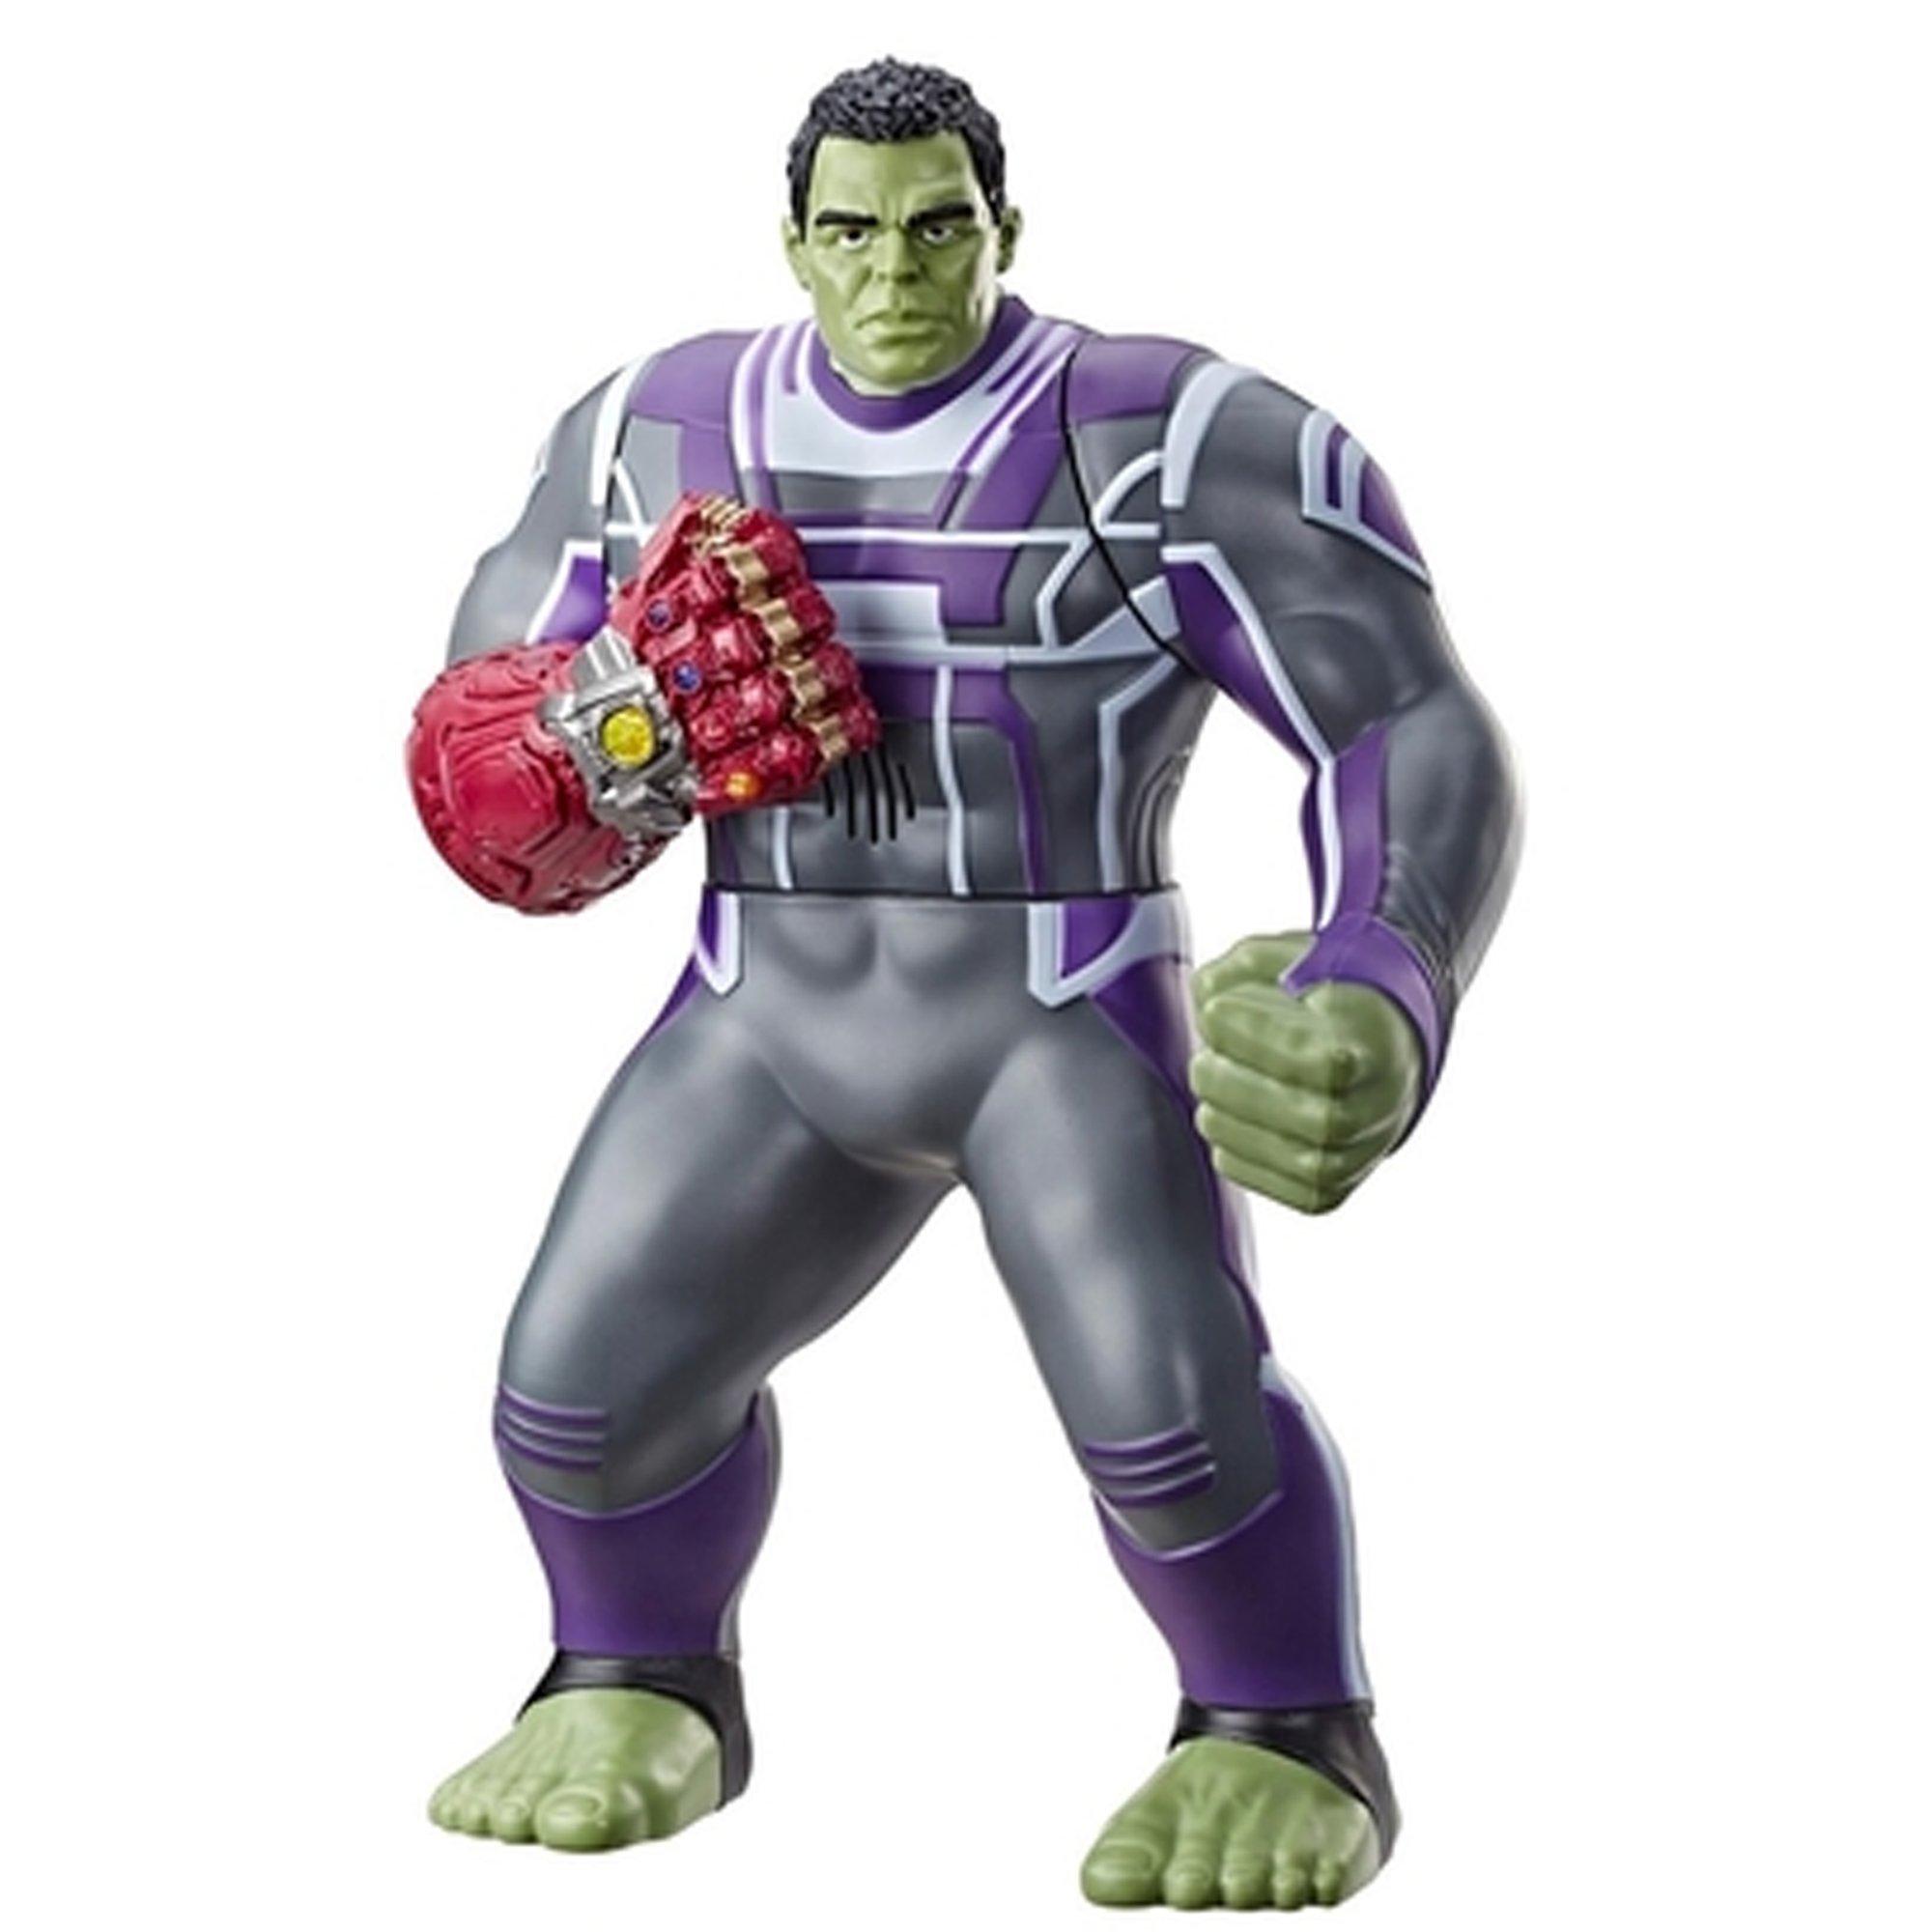 Avengers - Power Punch Hulk (E3313EW0)